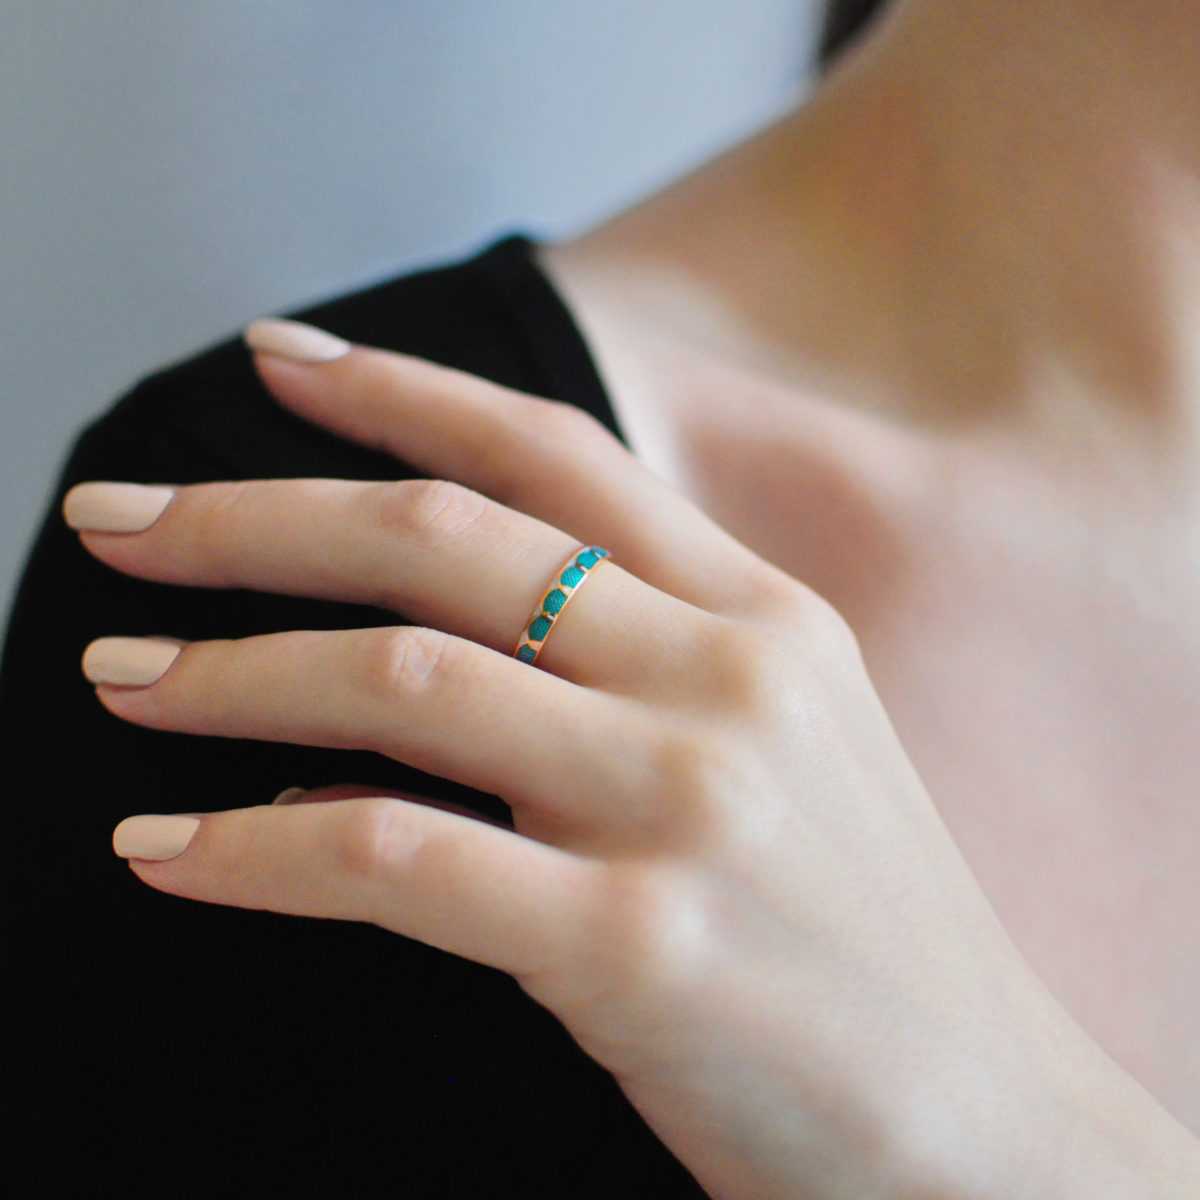 Zolochenie zelenaya 5 1200x1200 - Кольцо серебряное «Седмица» (золочение), зеленое